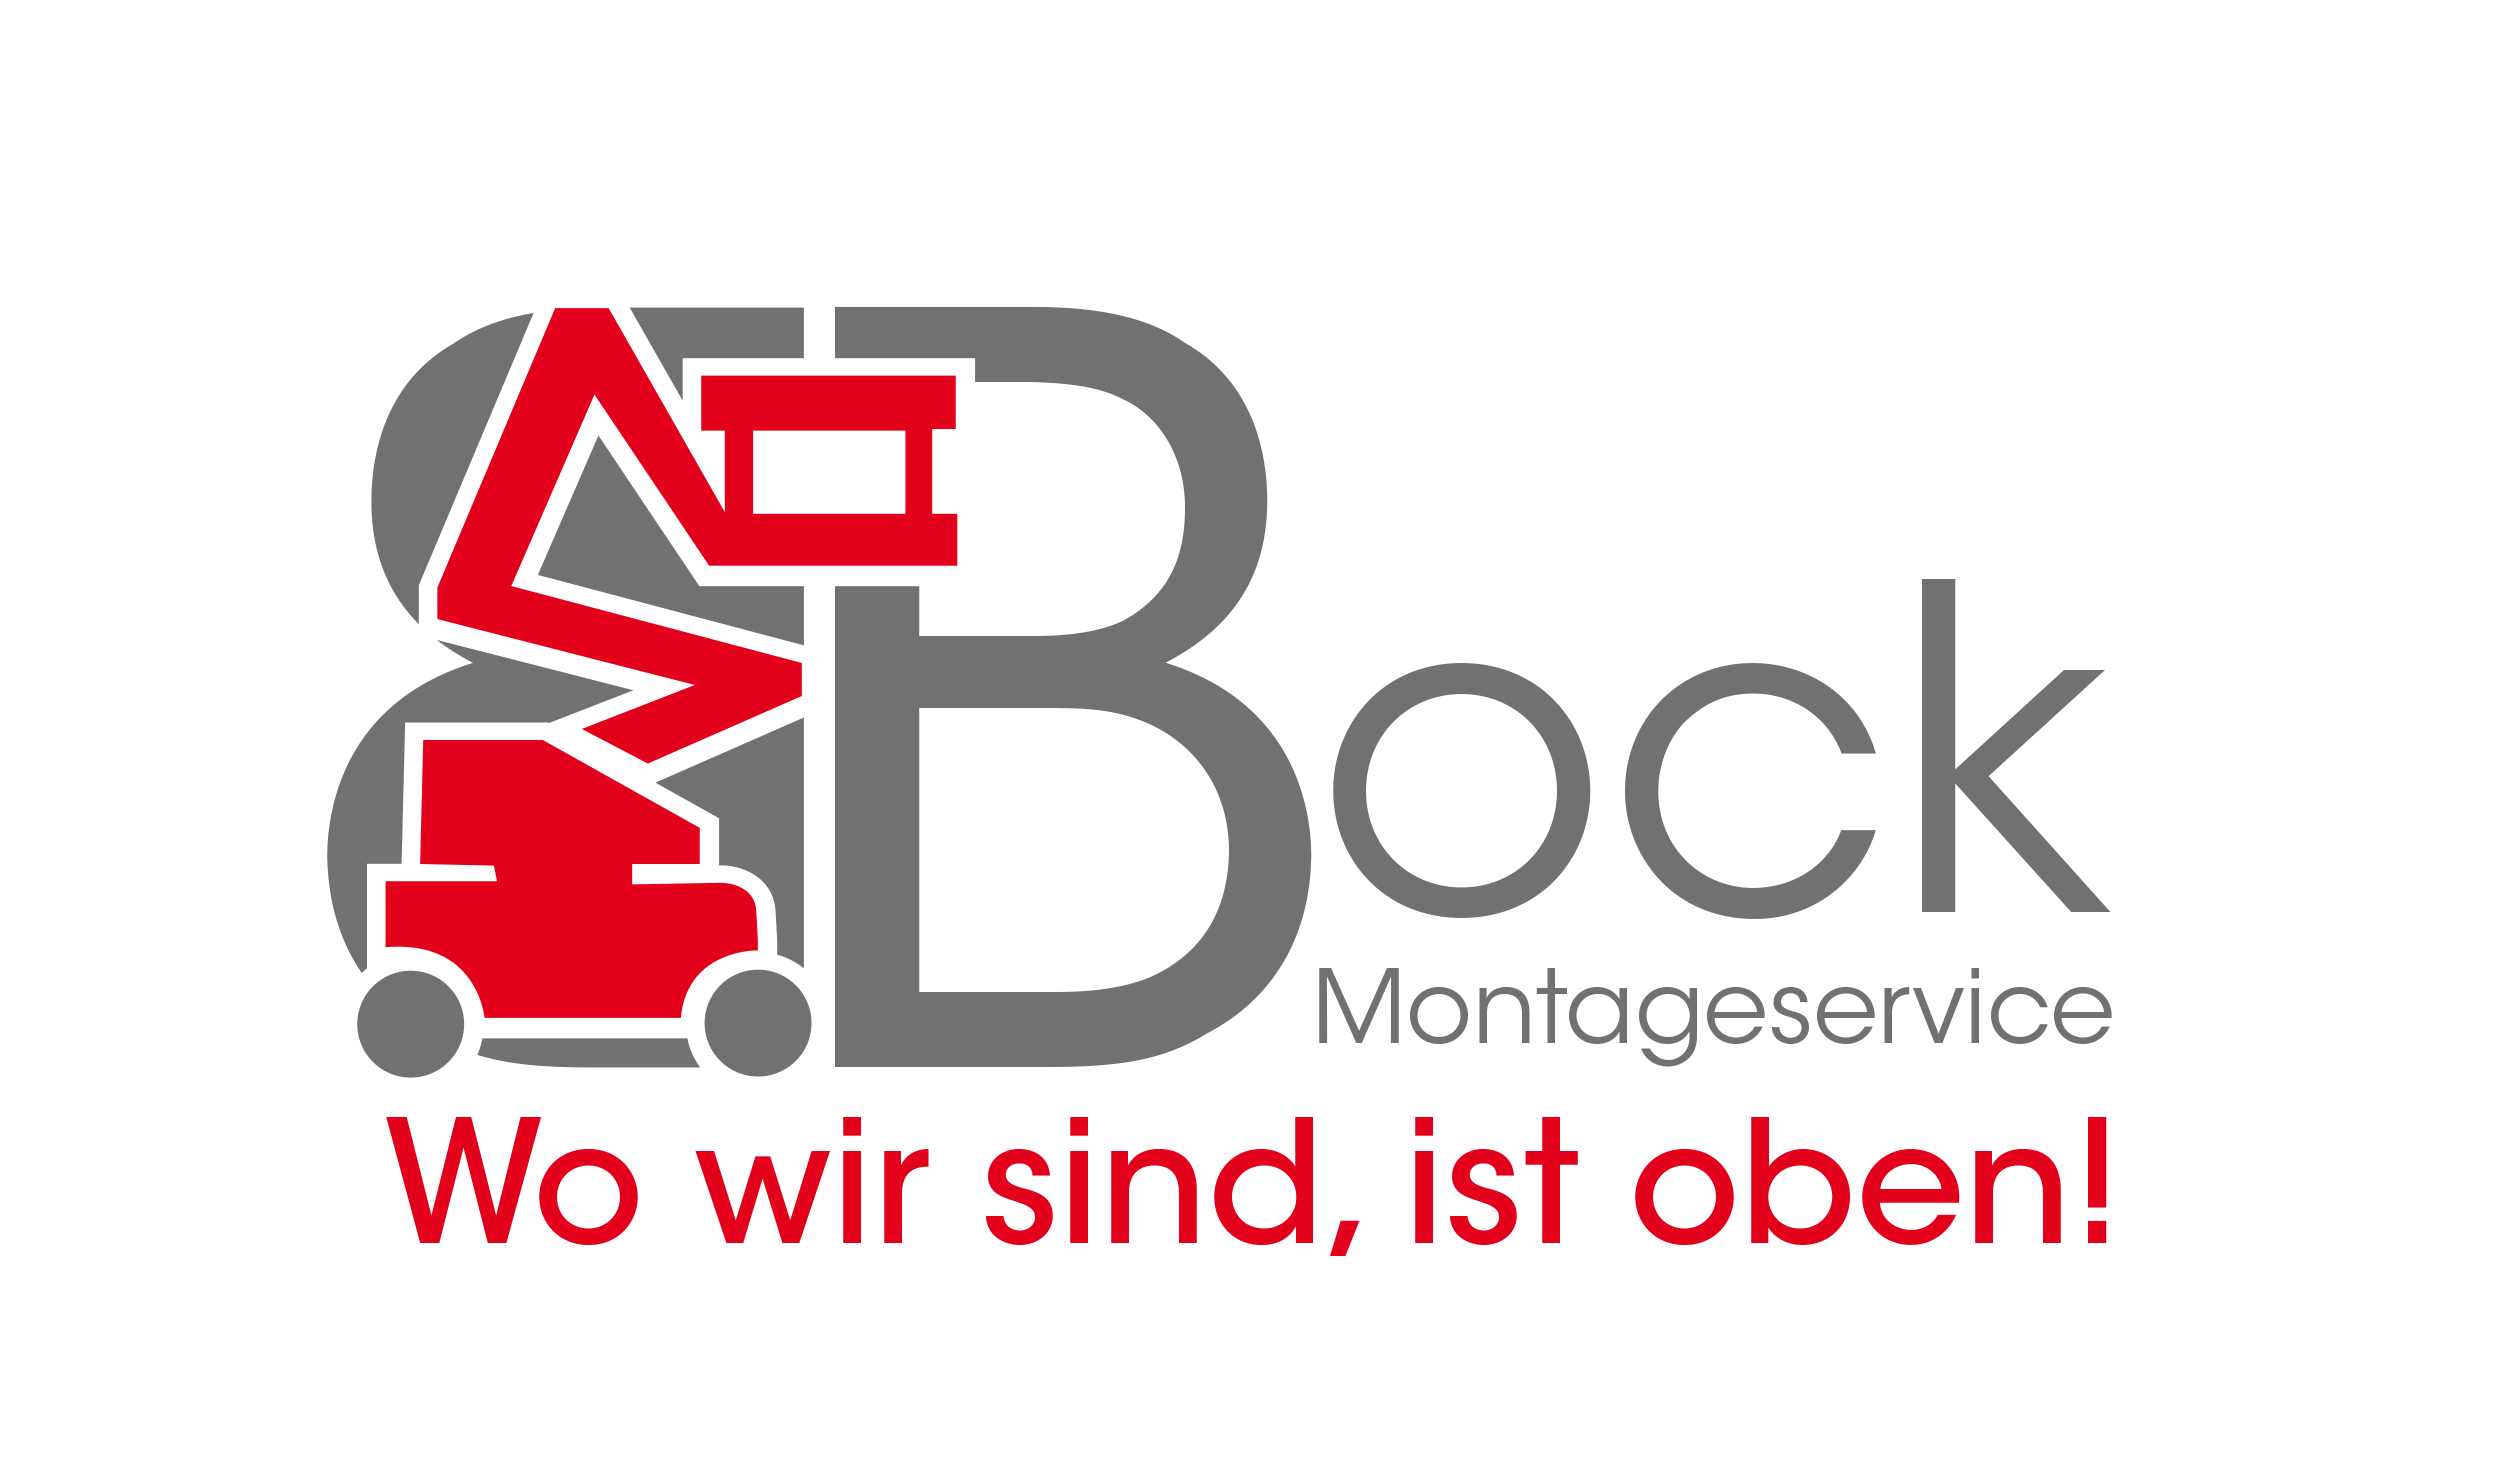 Bock-Montageservice